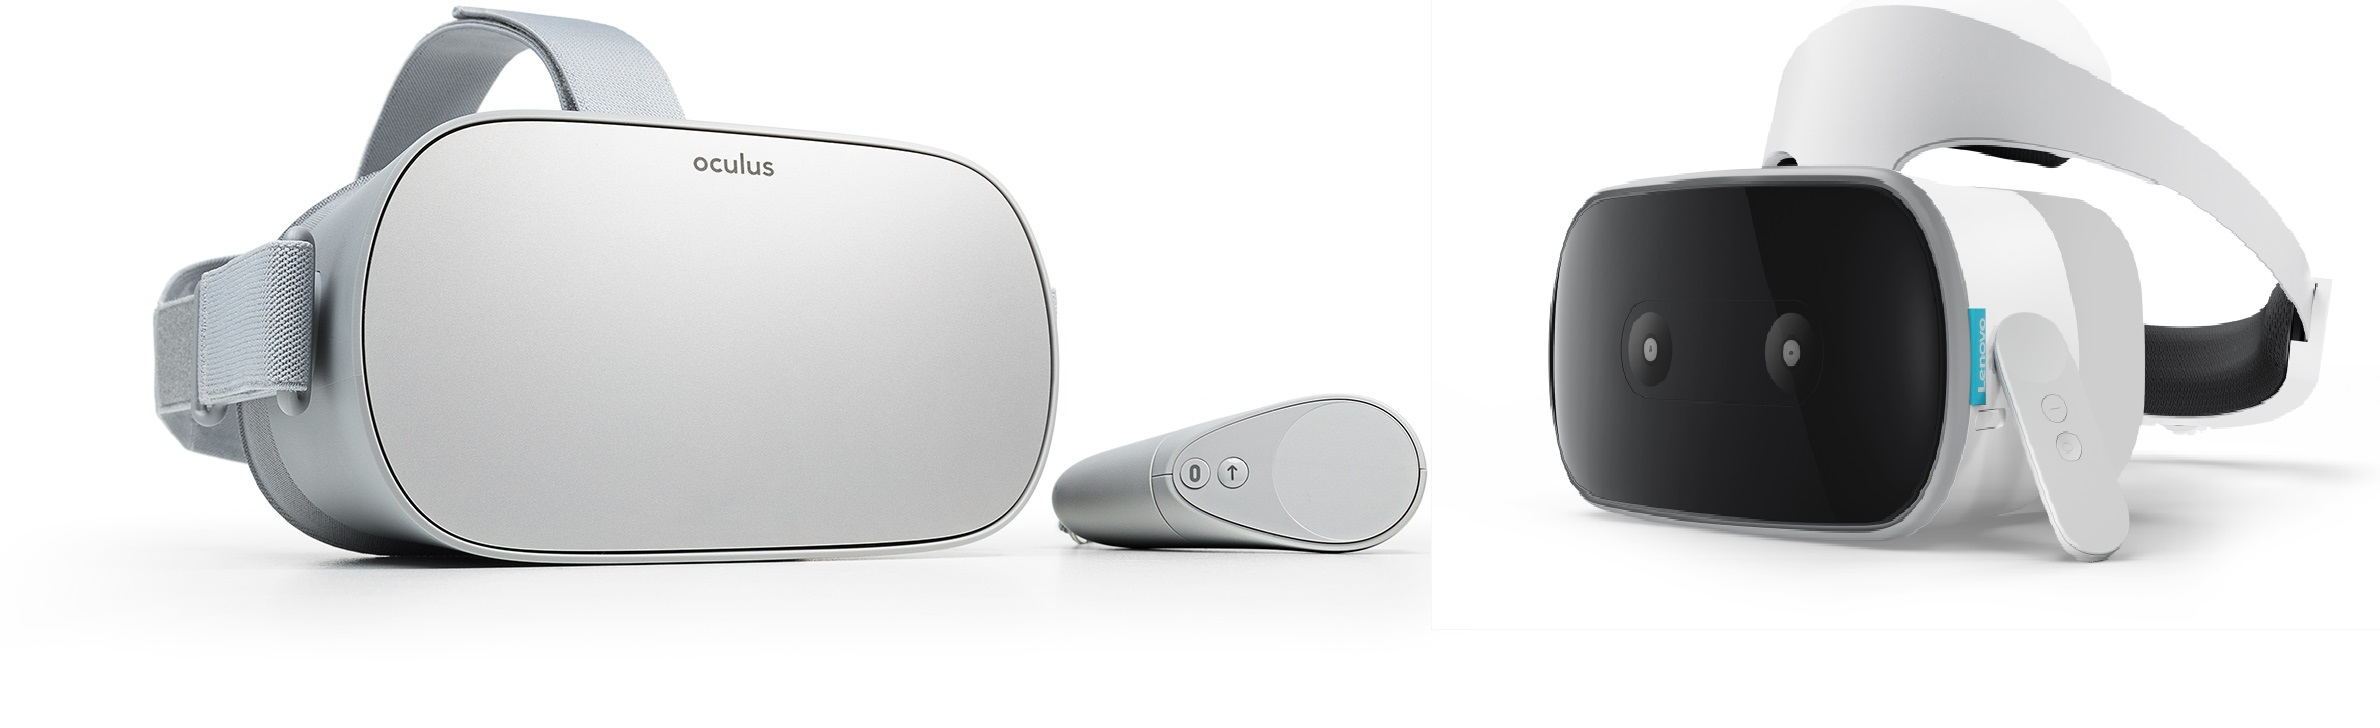 Oculus Go vs Lenovo Mirage Solo